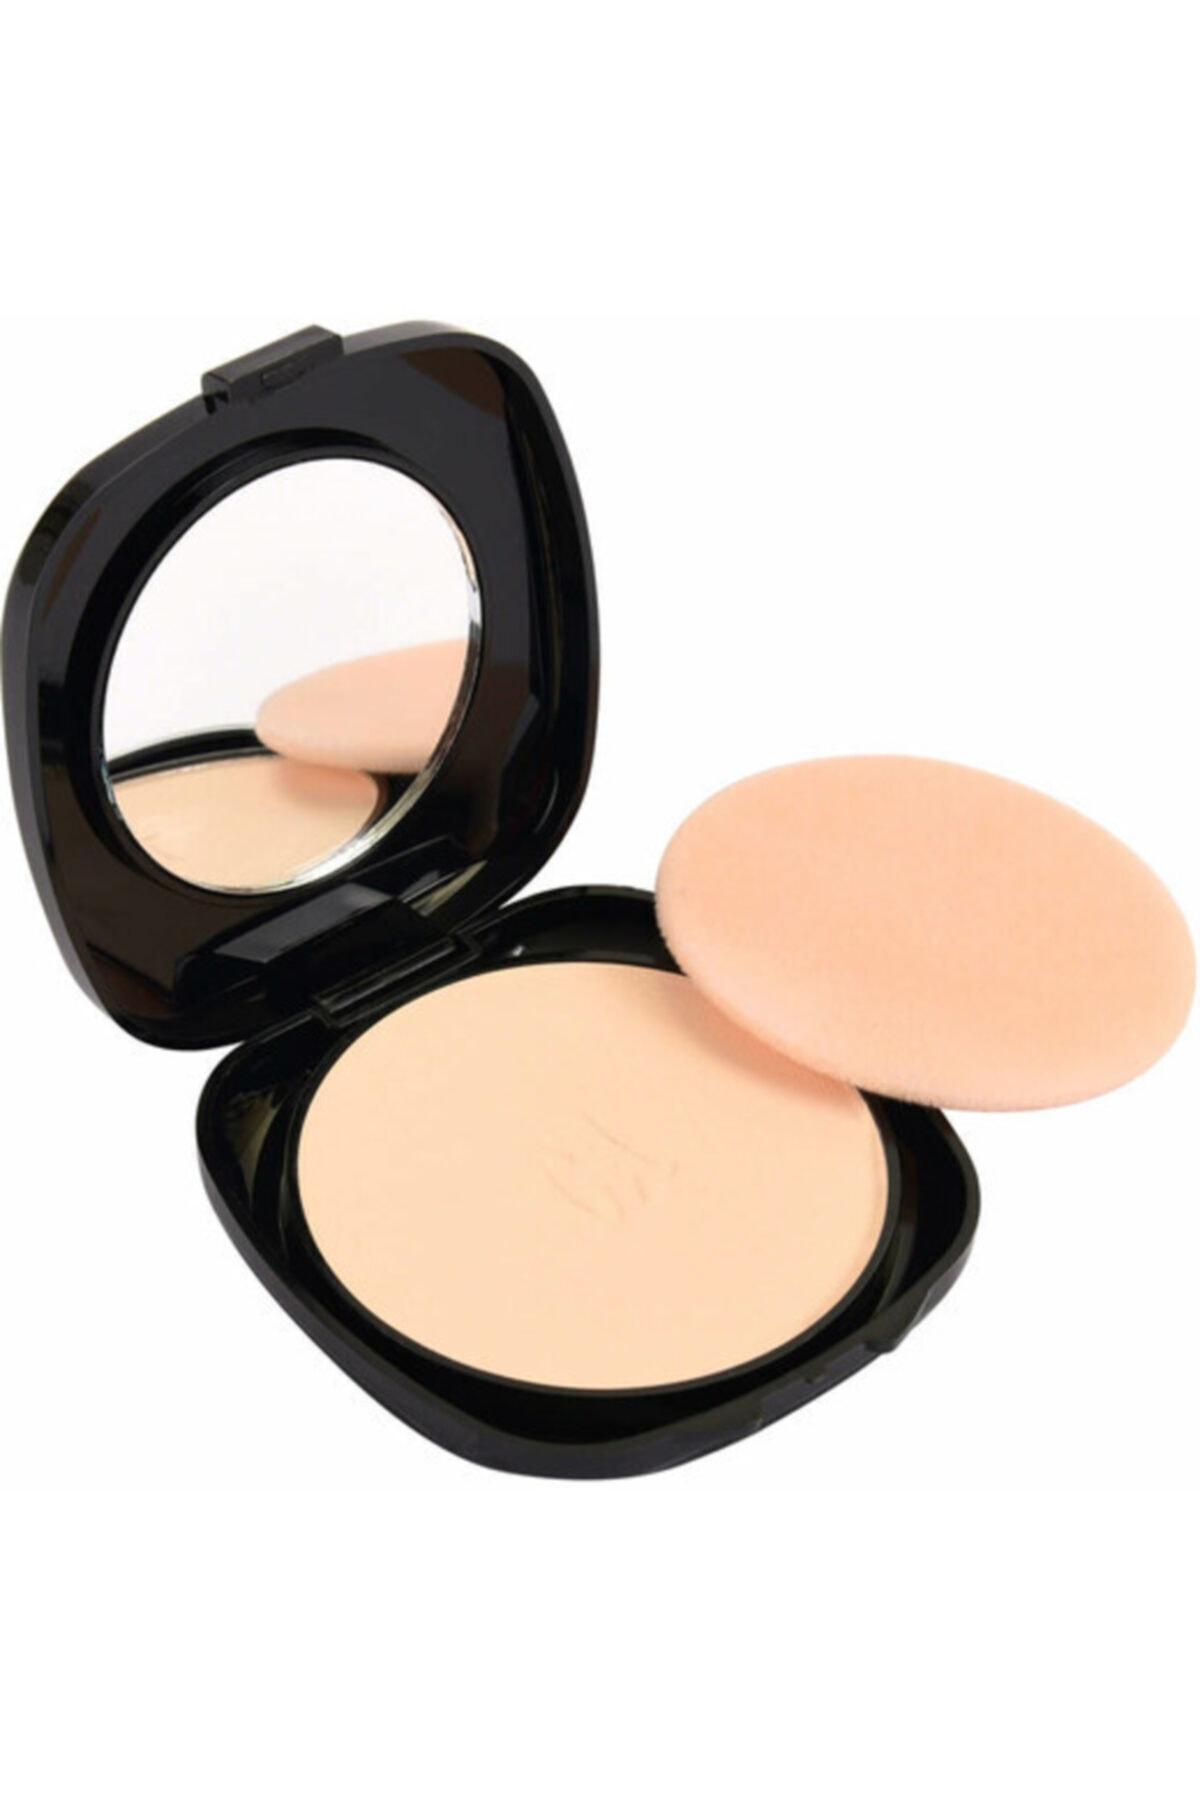 Catherine Arley Pudra - Compact Powder 03 8691167026013 1